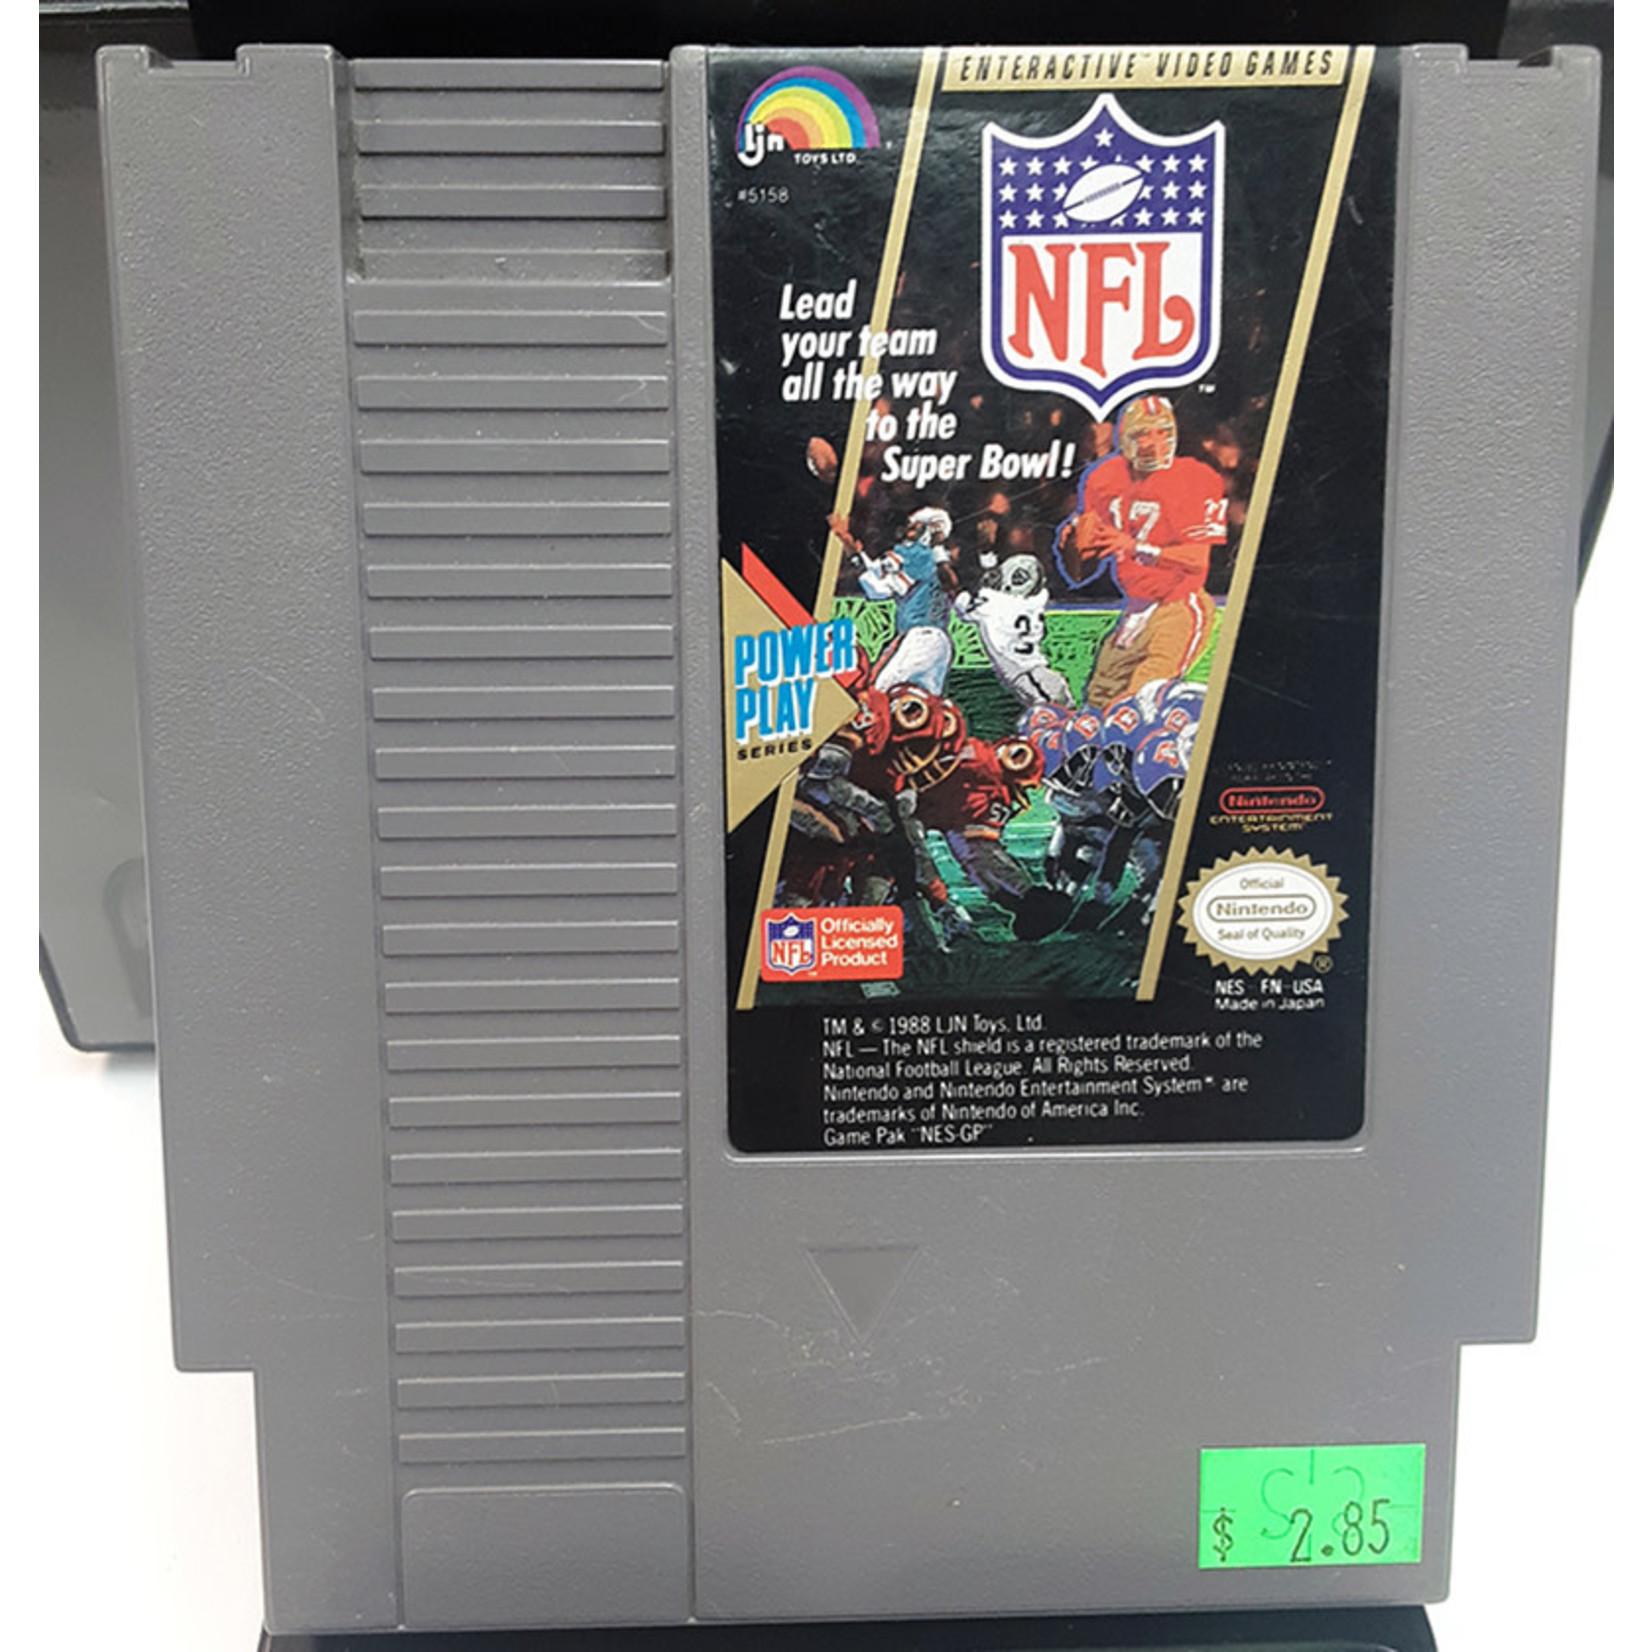 nesu-NFL (cartridge)